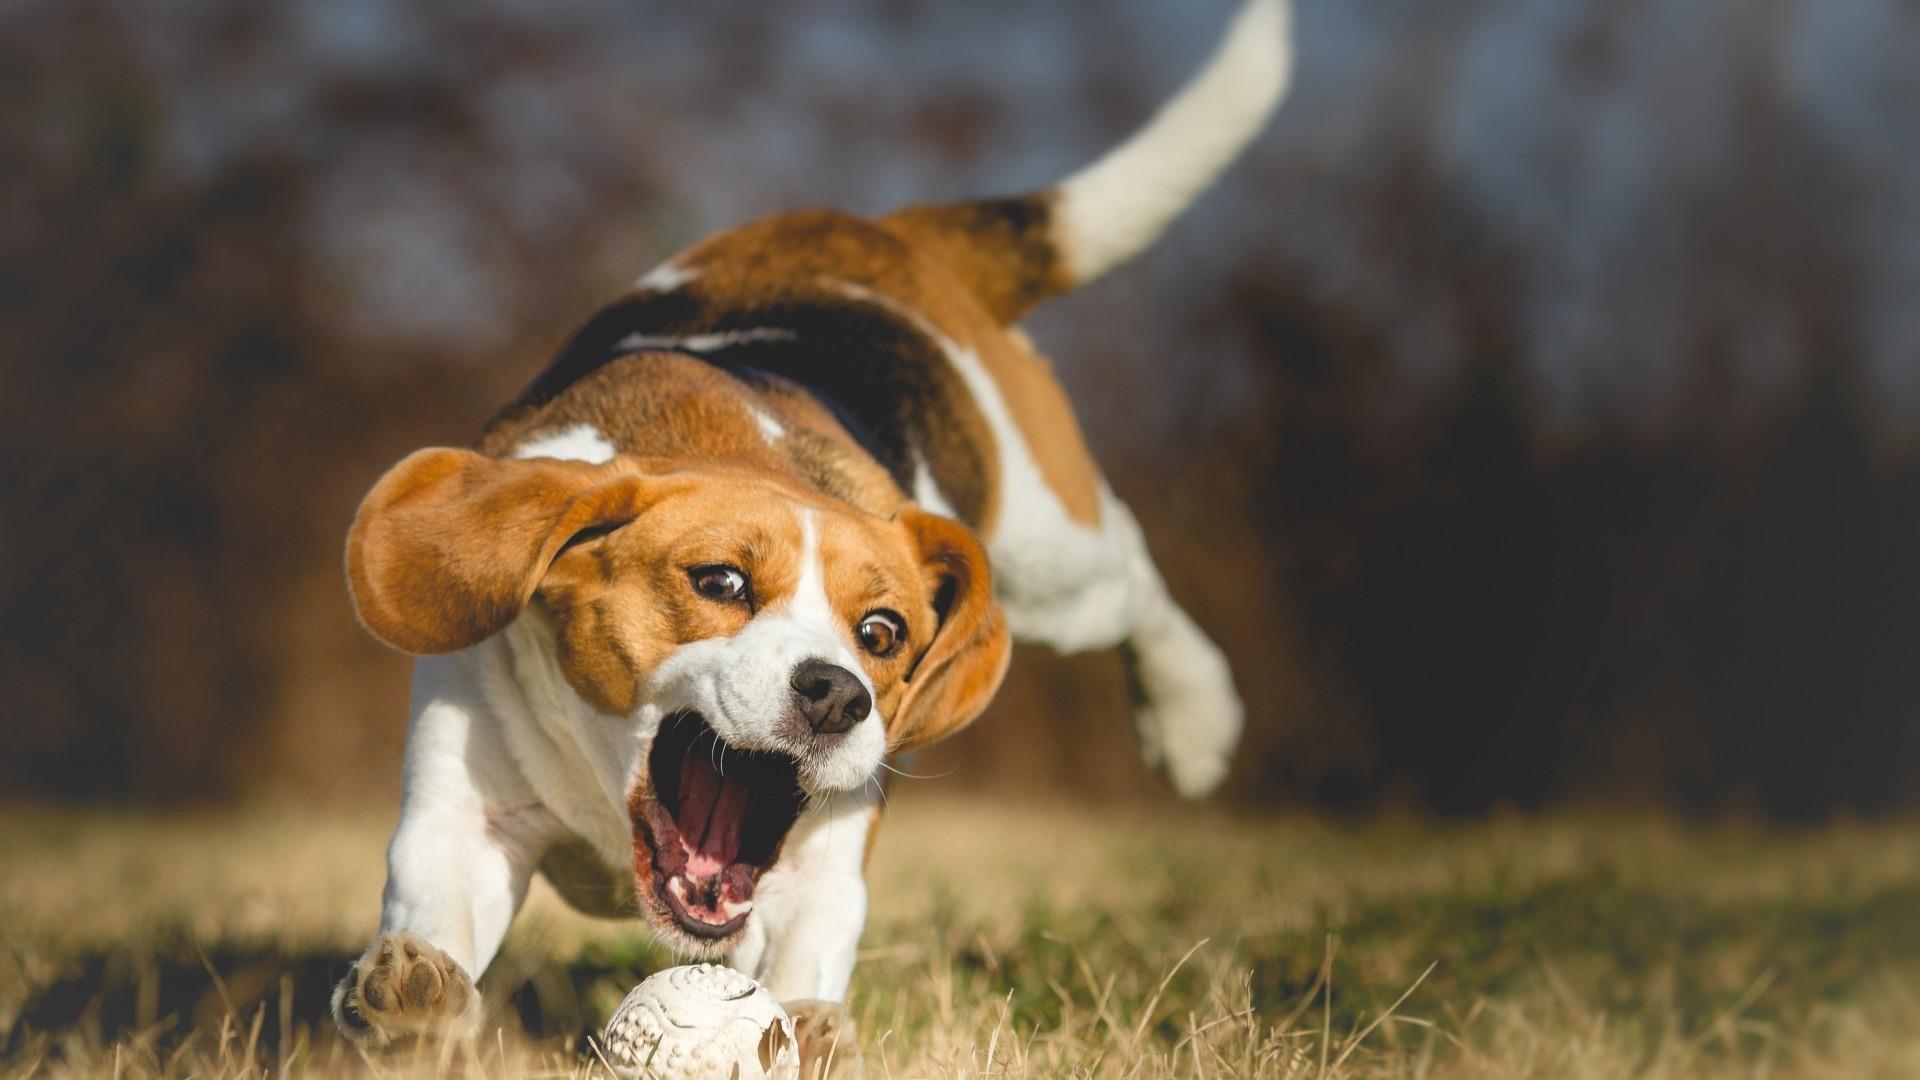 Beagle doggie playing wallpaper